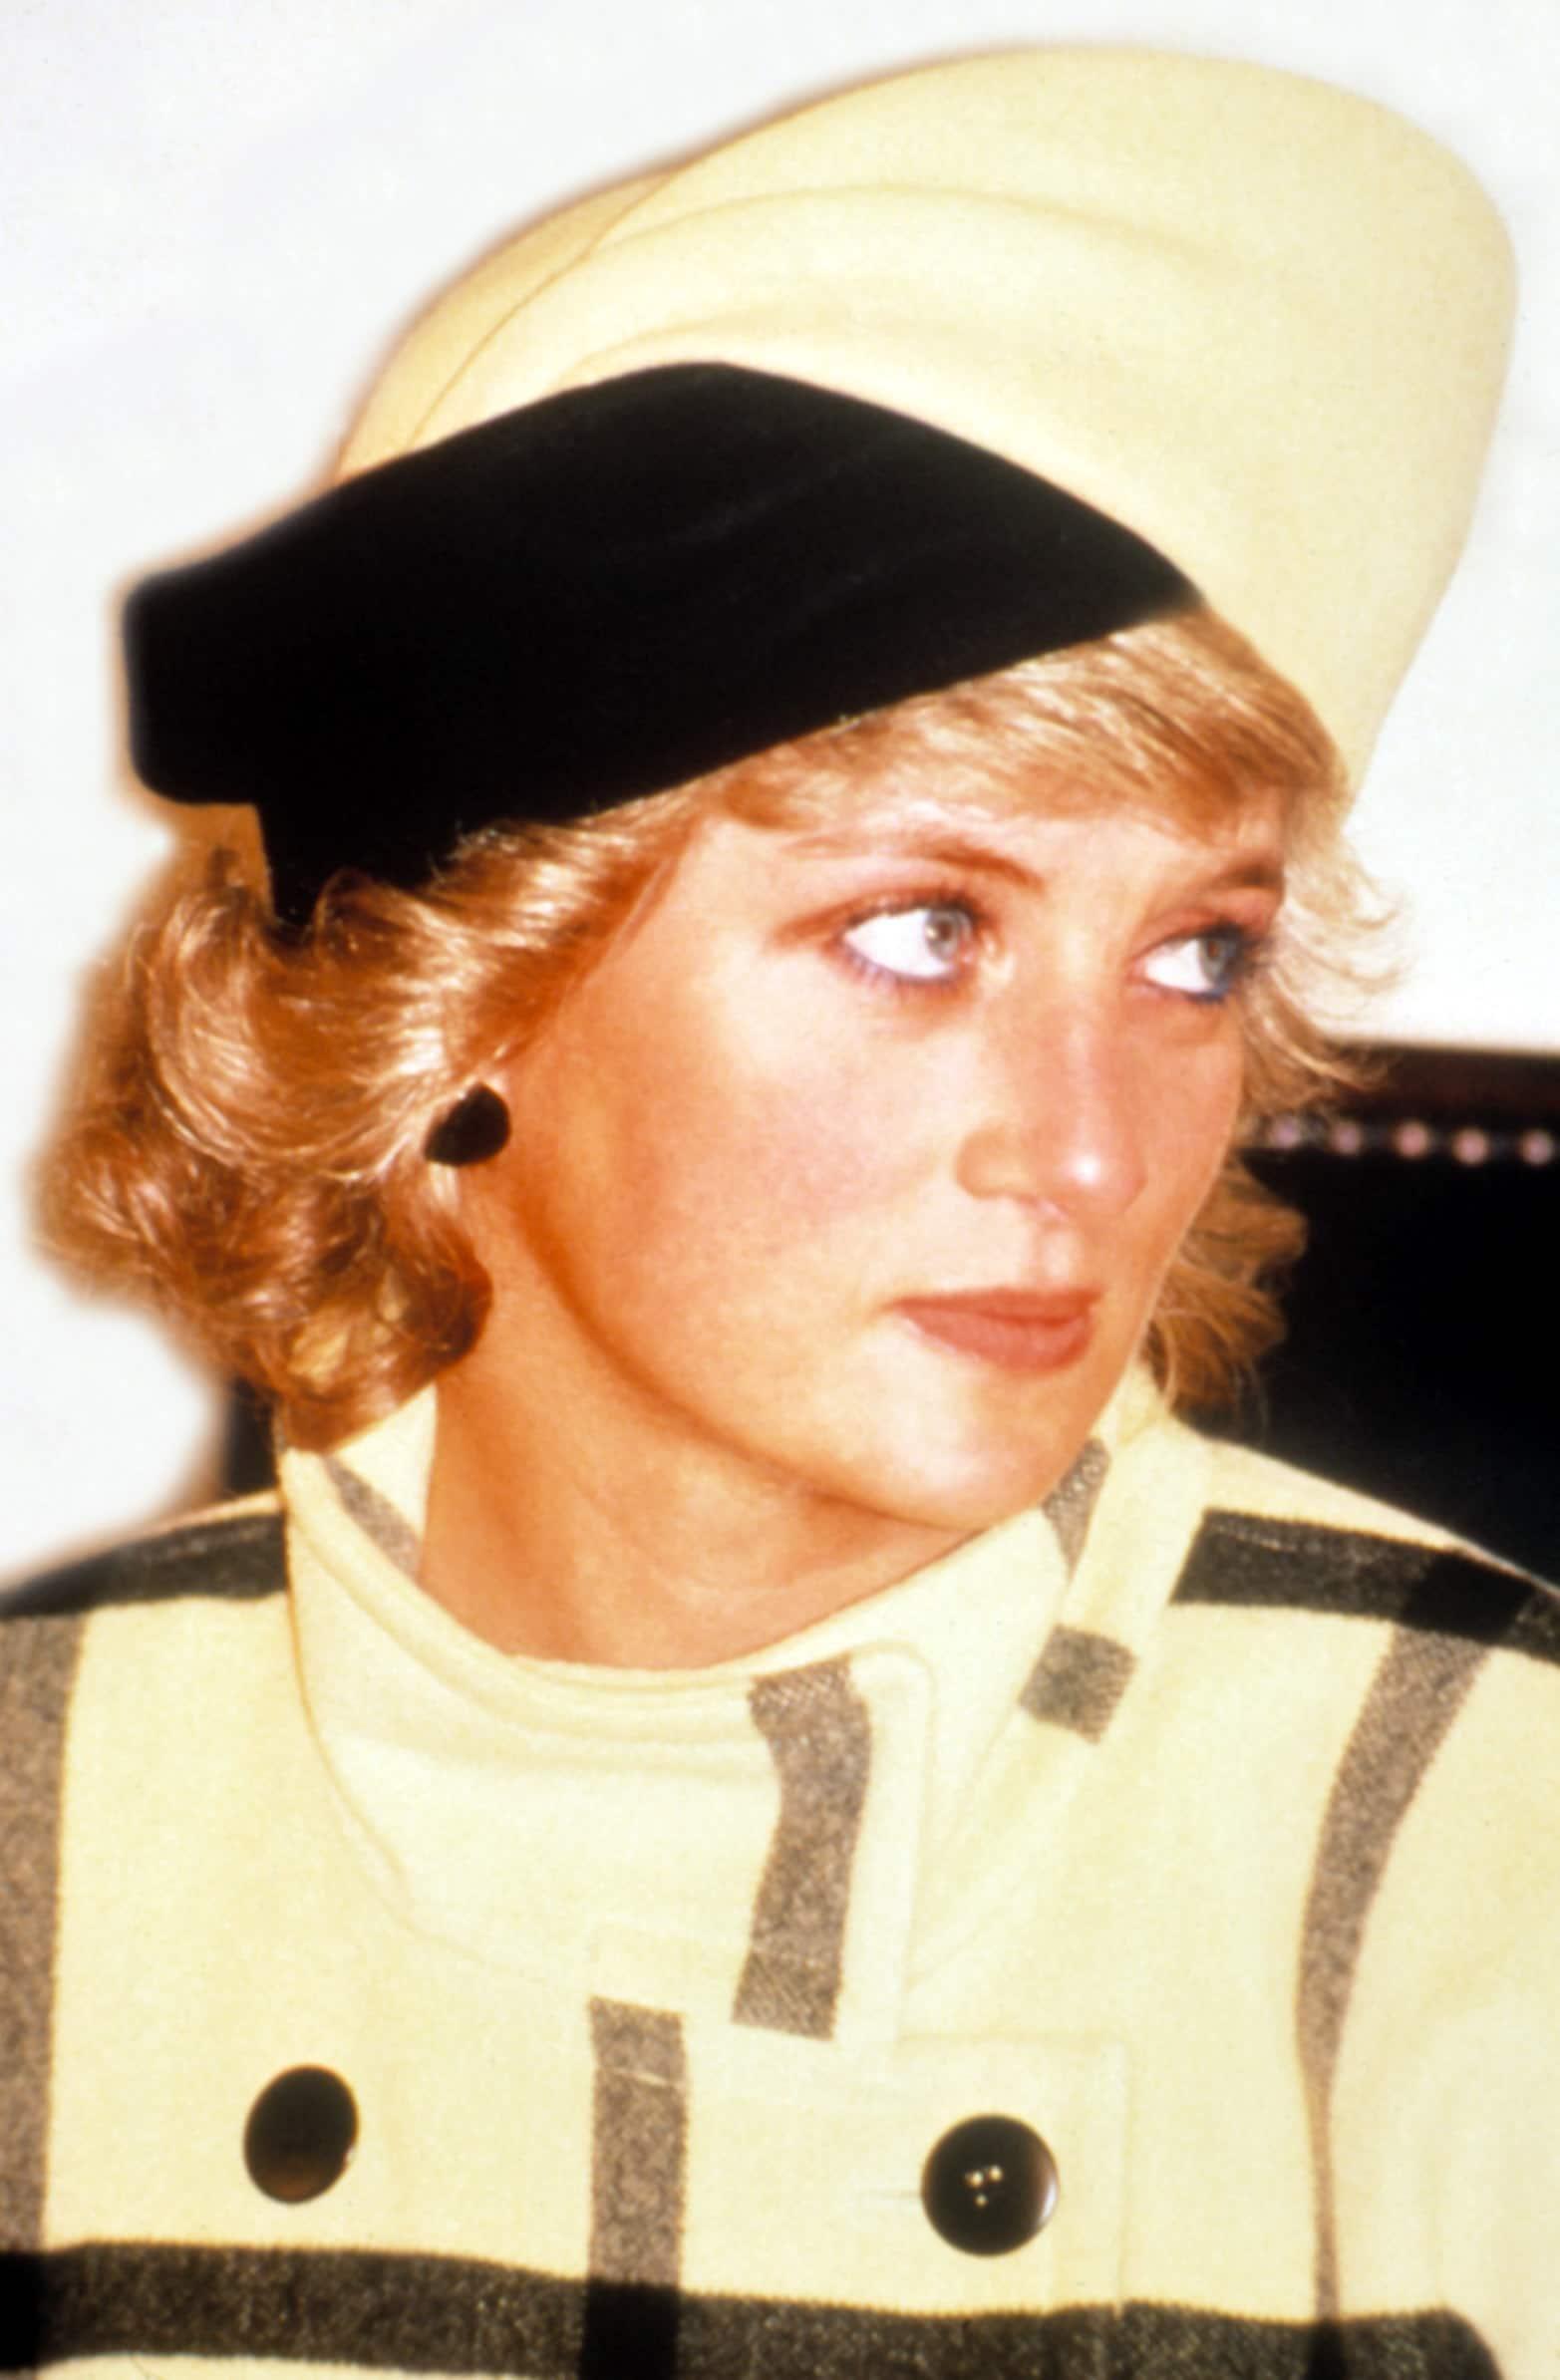 PRINCESS DIANA, early 1980s